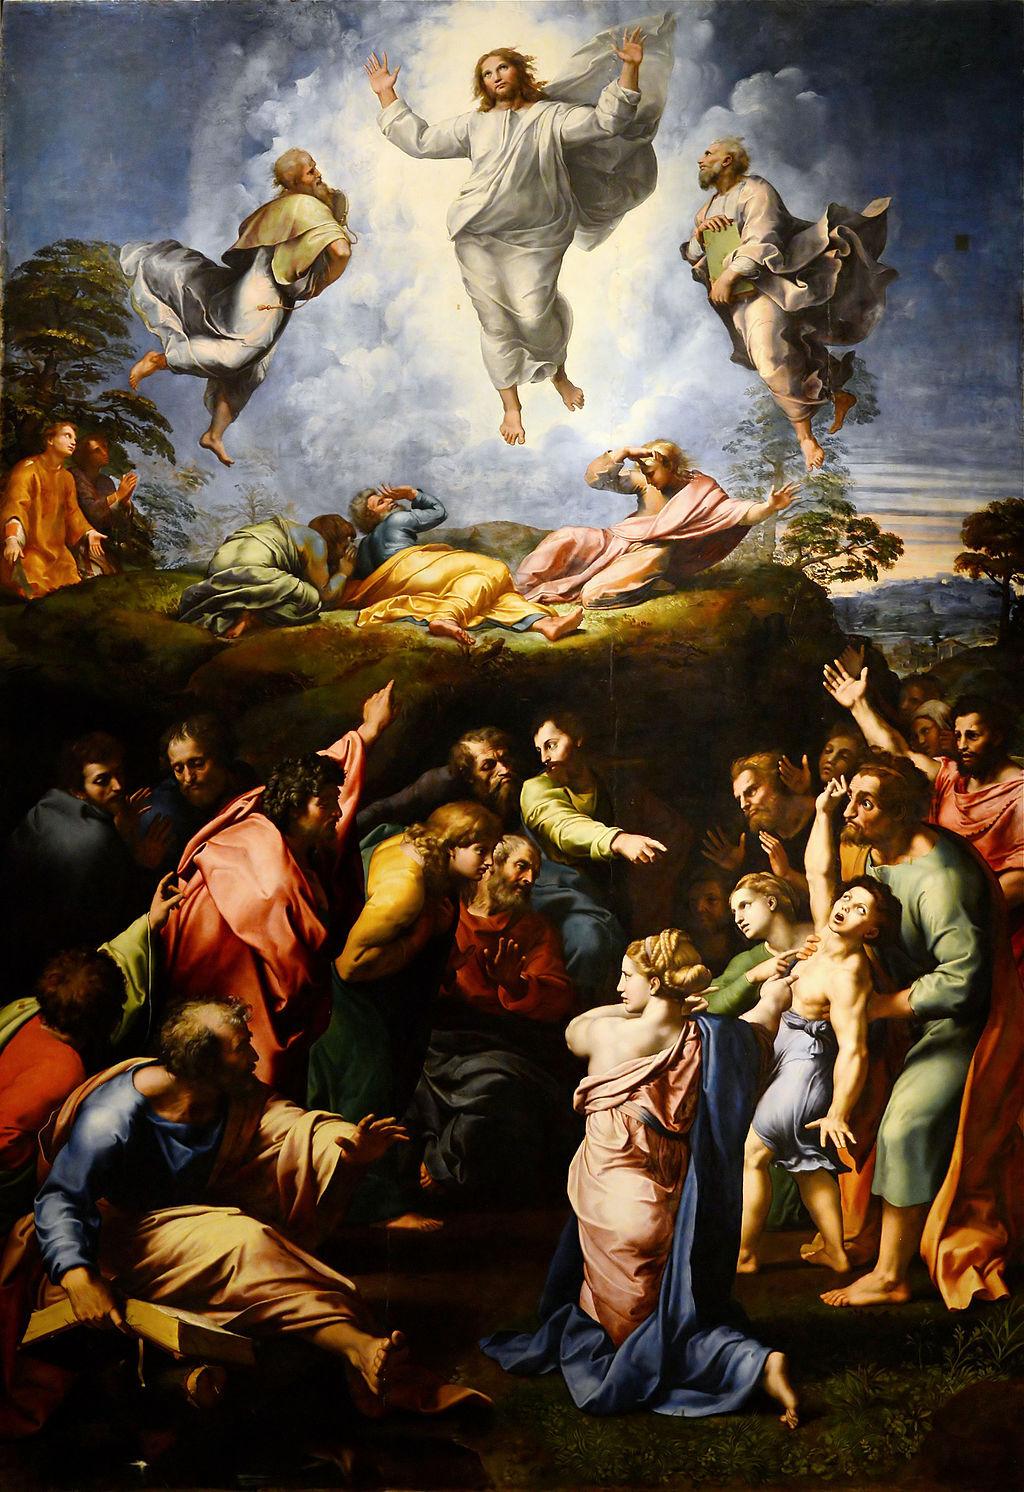 Rafael, La Transfiguración, 1516-20.  Imagen a través de Wikimedia Commons.